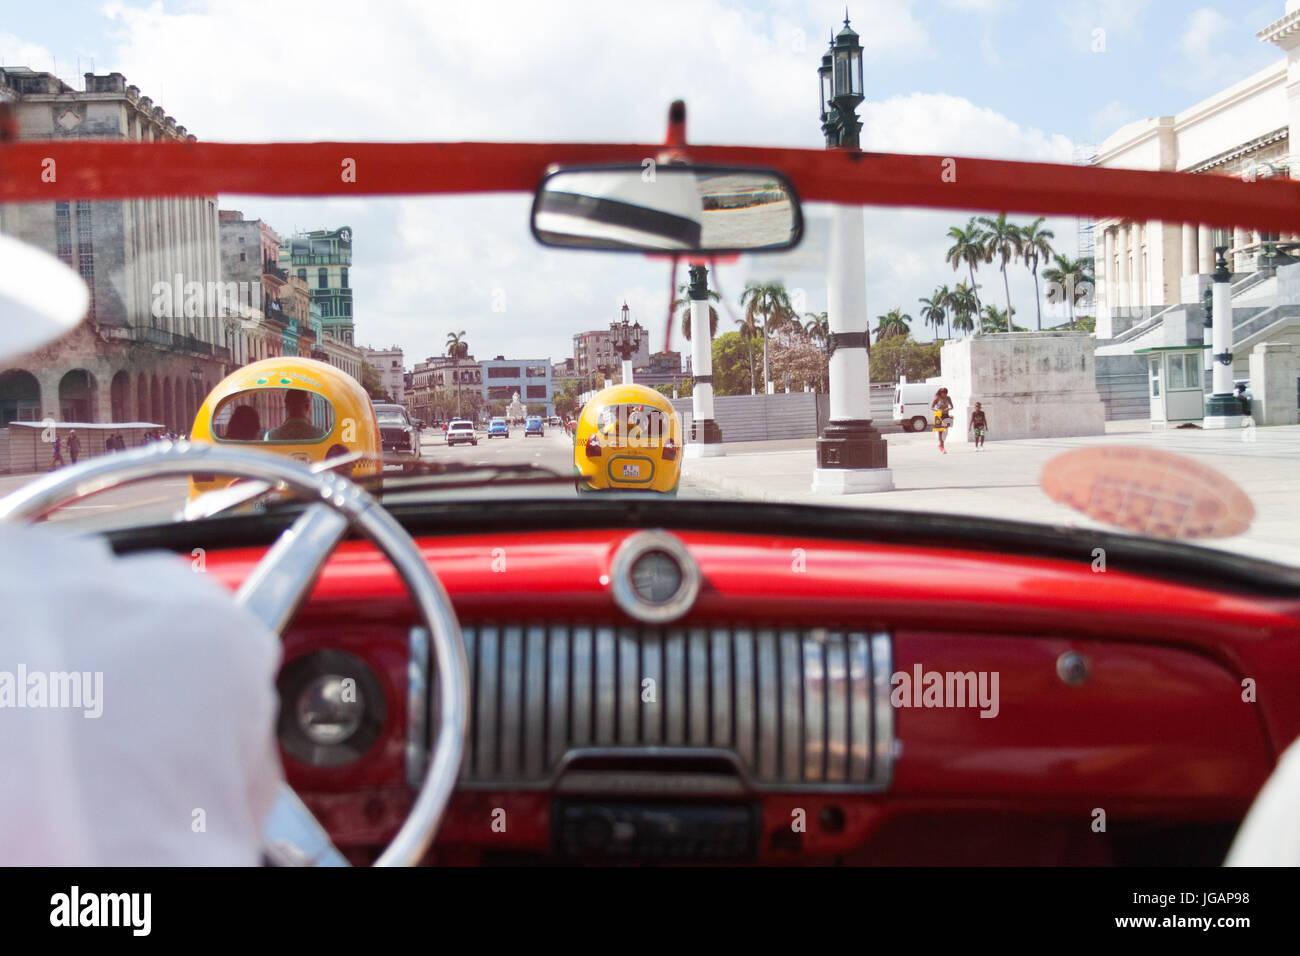 Ride inside old American classic car in Havana, Cuba Stock Photo ...